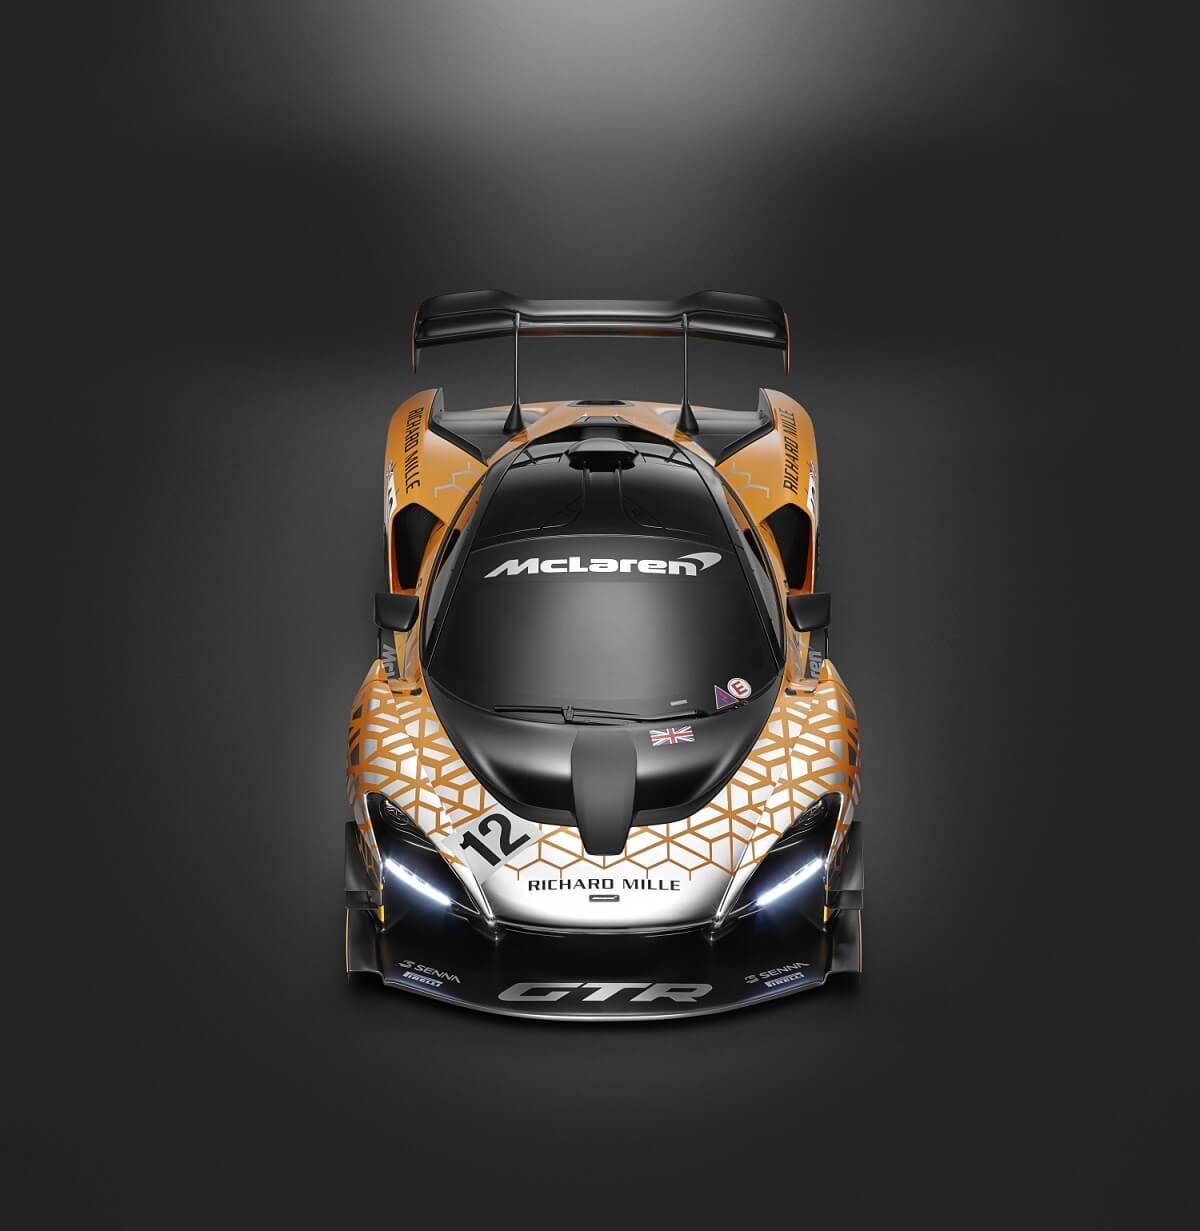 8991-McLaren+Senna+GTR+Concept_02.jpg